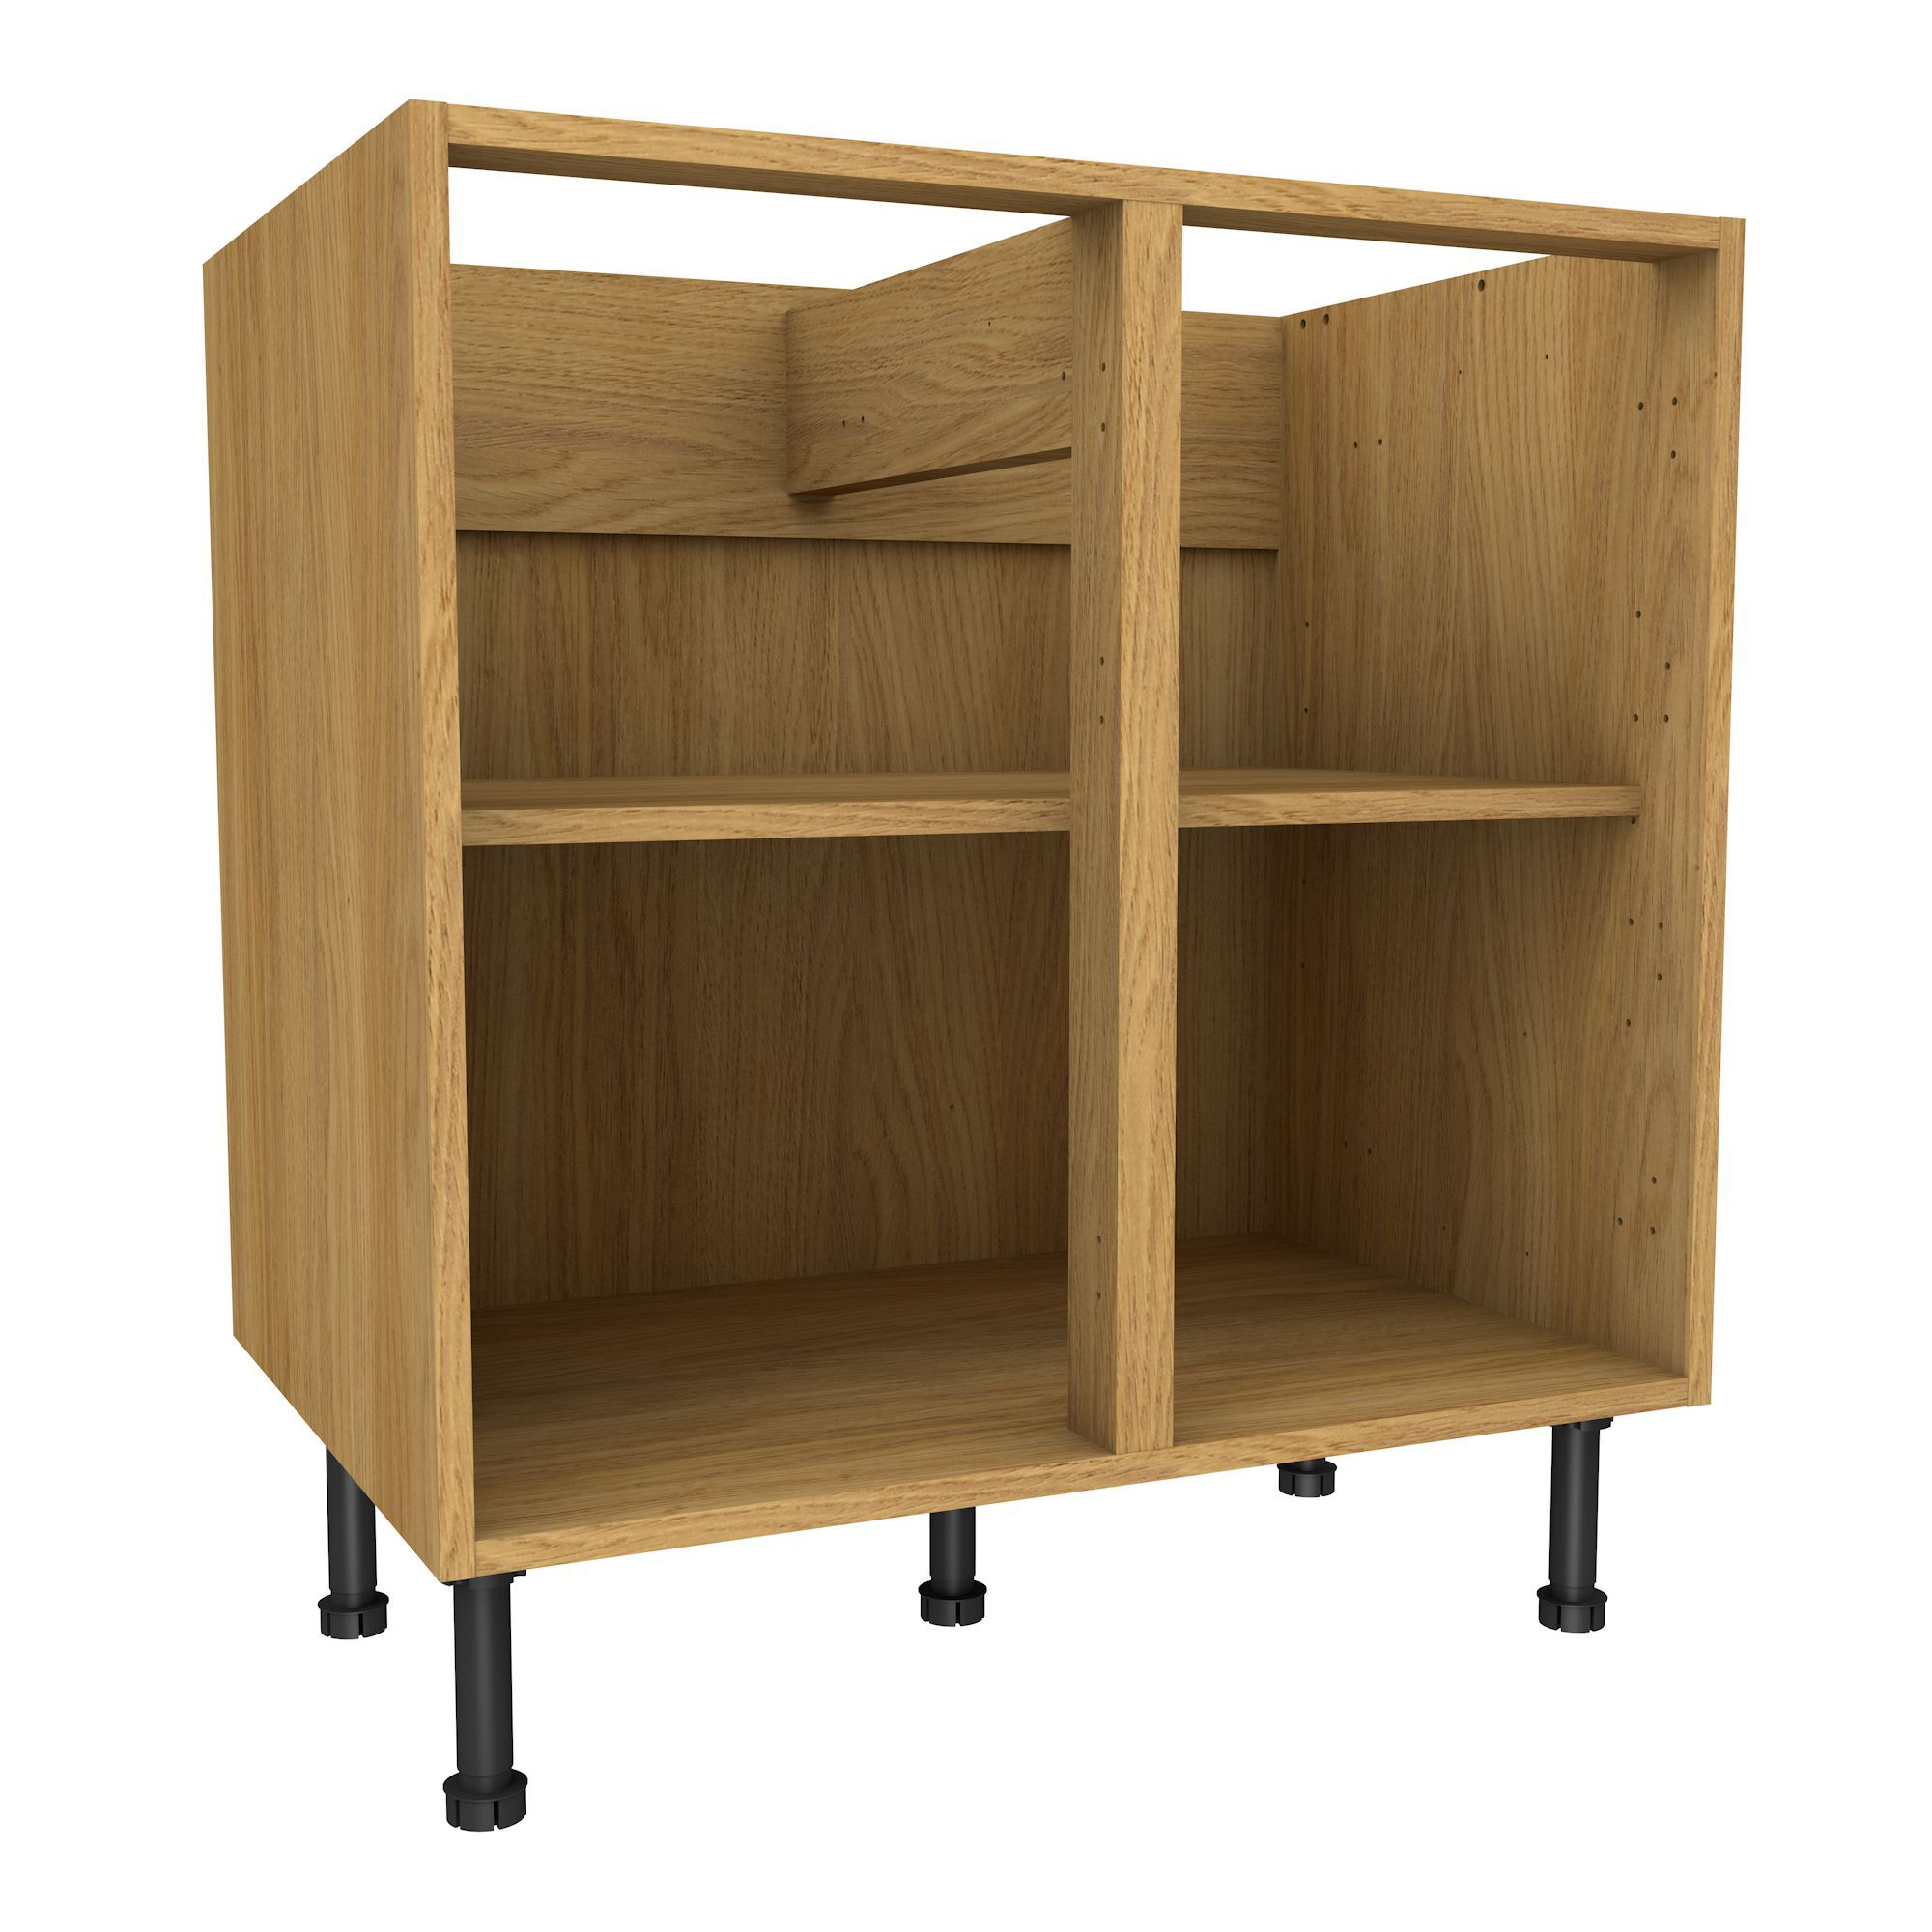 Kitchen base cabinets oak - Cooke Lewis Oak Effect Standard Base Cabinet W 800mm Departments Diy At B Q